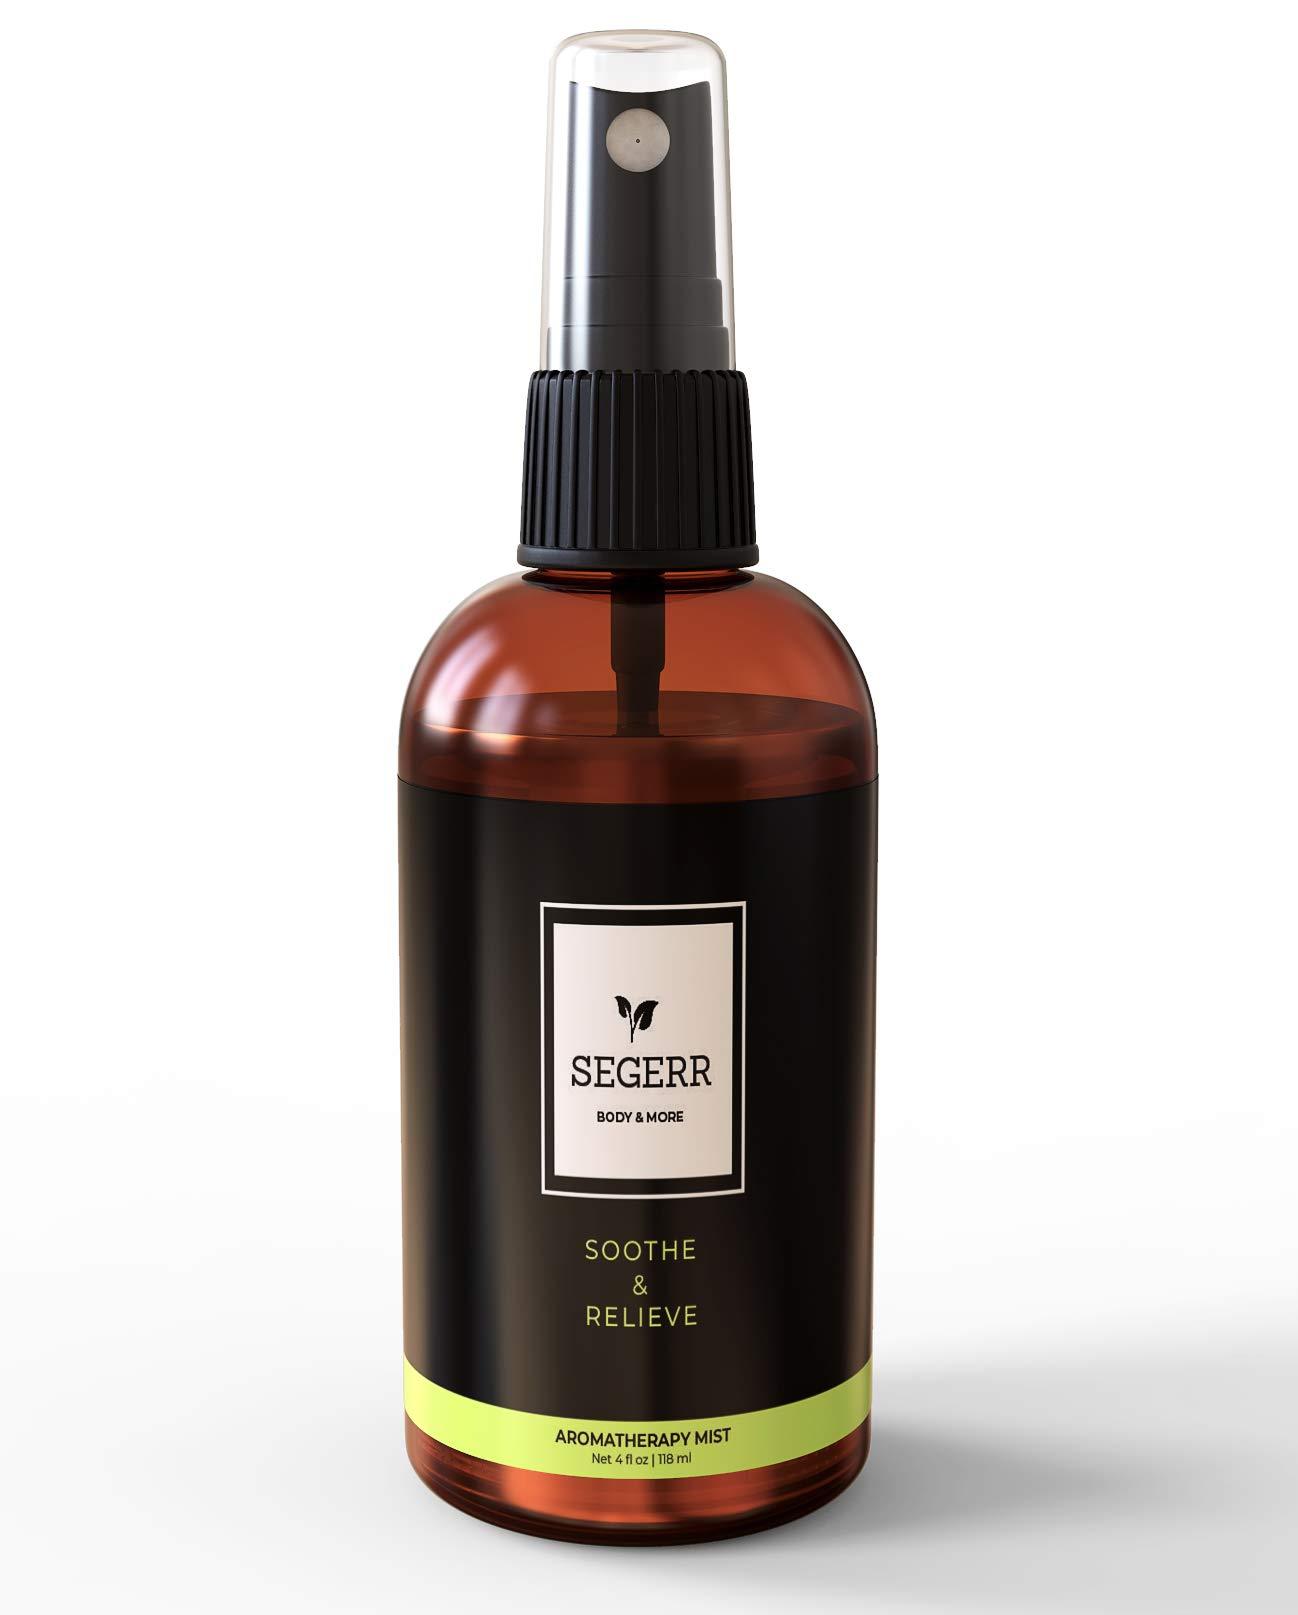 Eucalyptus, Lavender, Peppermint, Tea Tree, Cajeput Aromatherapy Mist - Shower Spray, Room Deodorizer. Spray on Pillows, Face Cloth, Linens, Bedroom (4 oz) by Segerr